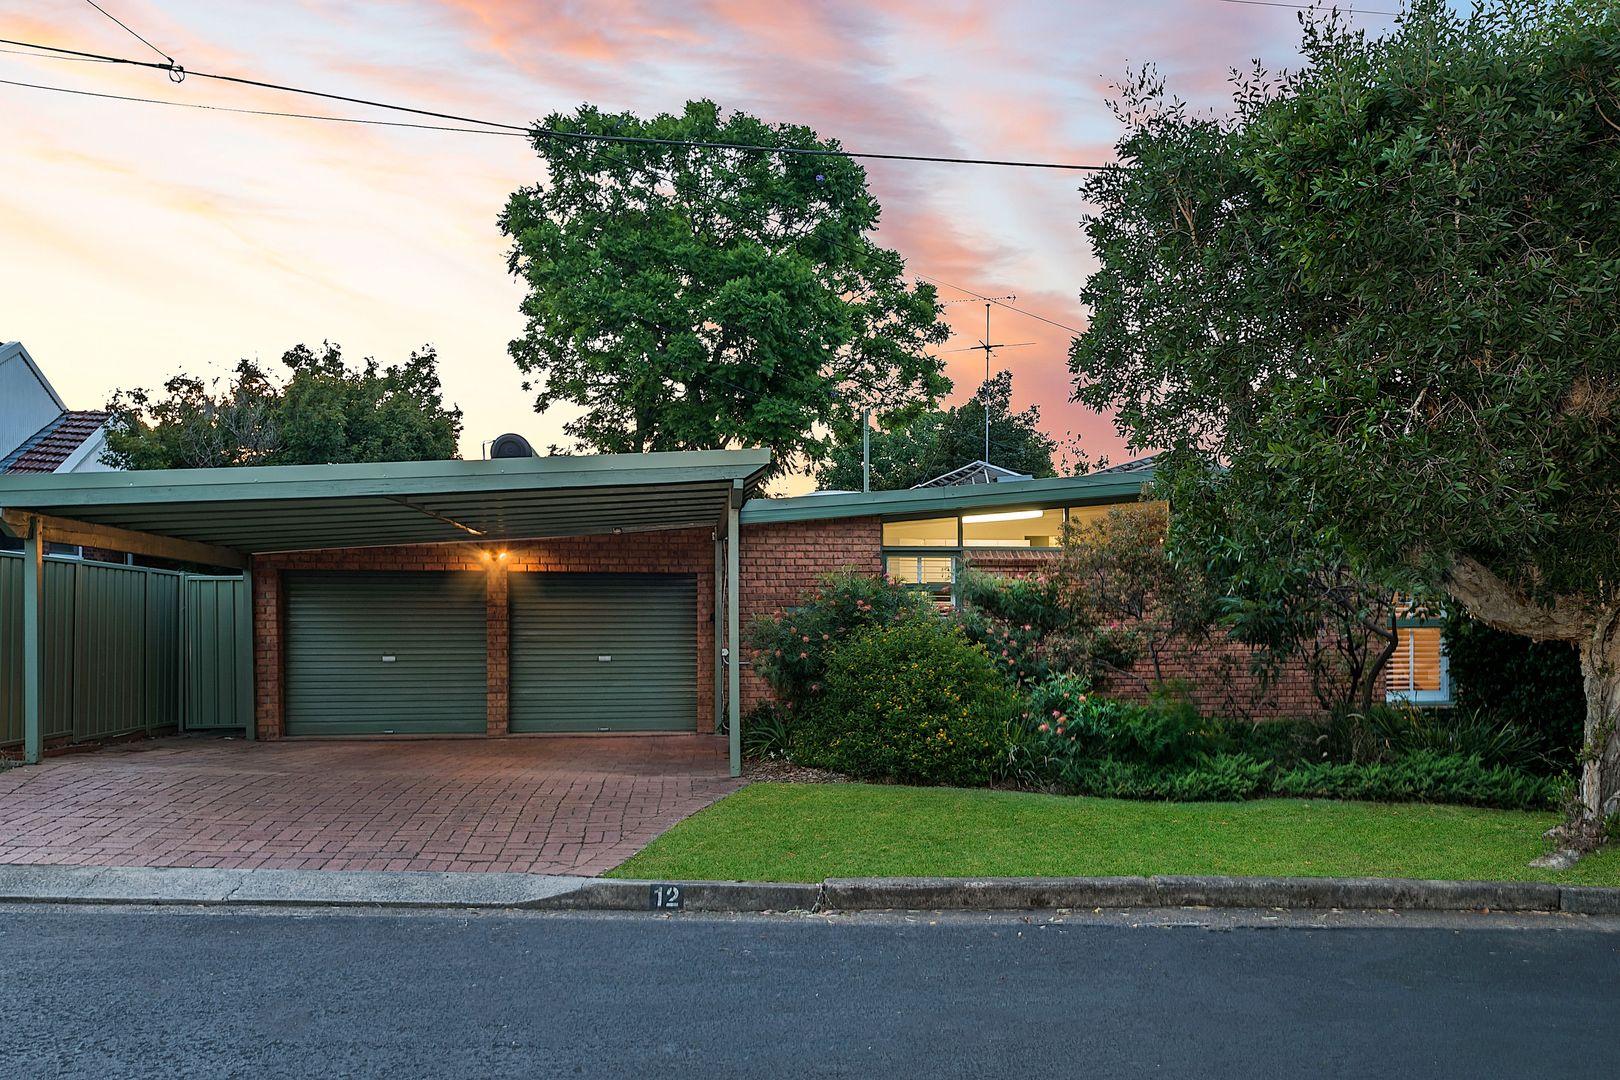 12 Burrell Crescent, Baulkham Hills NSW 2153, Image 0